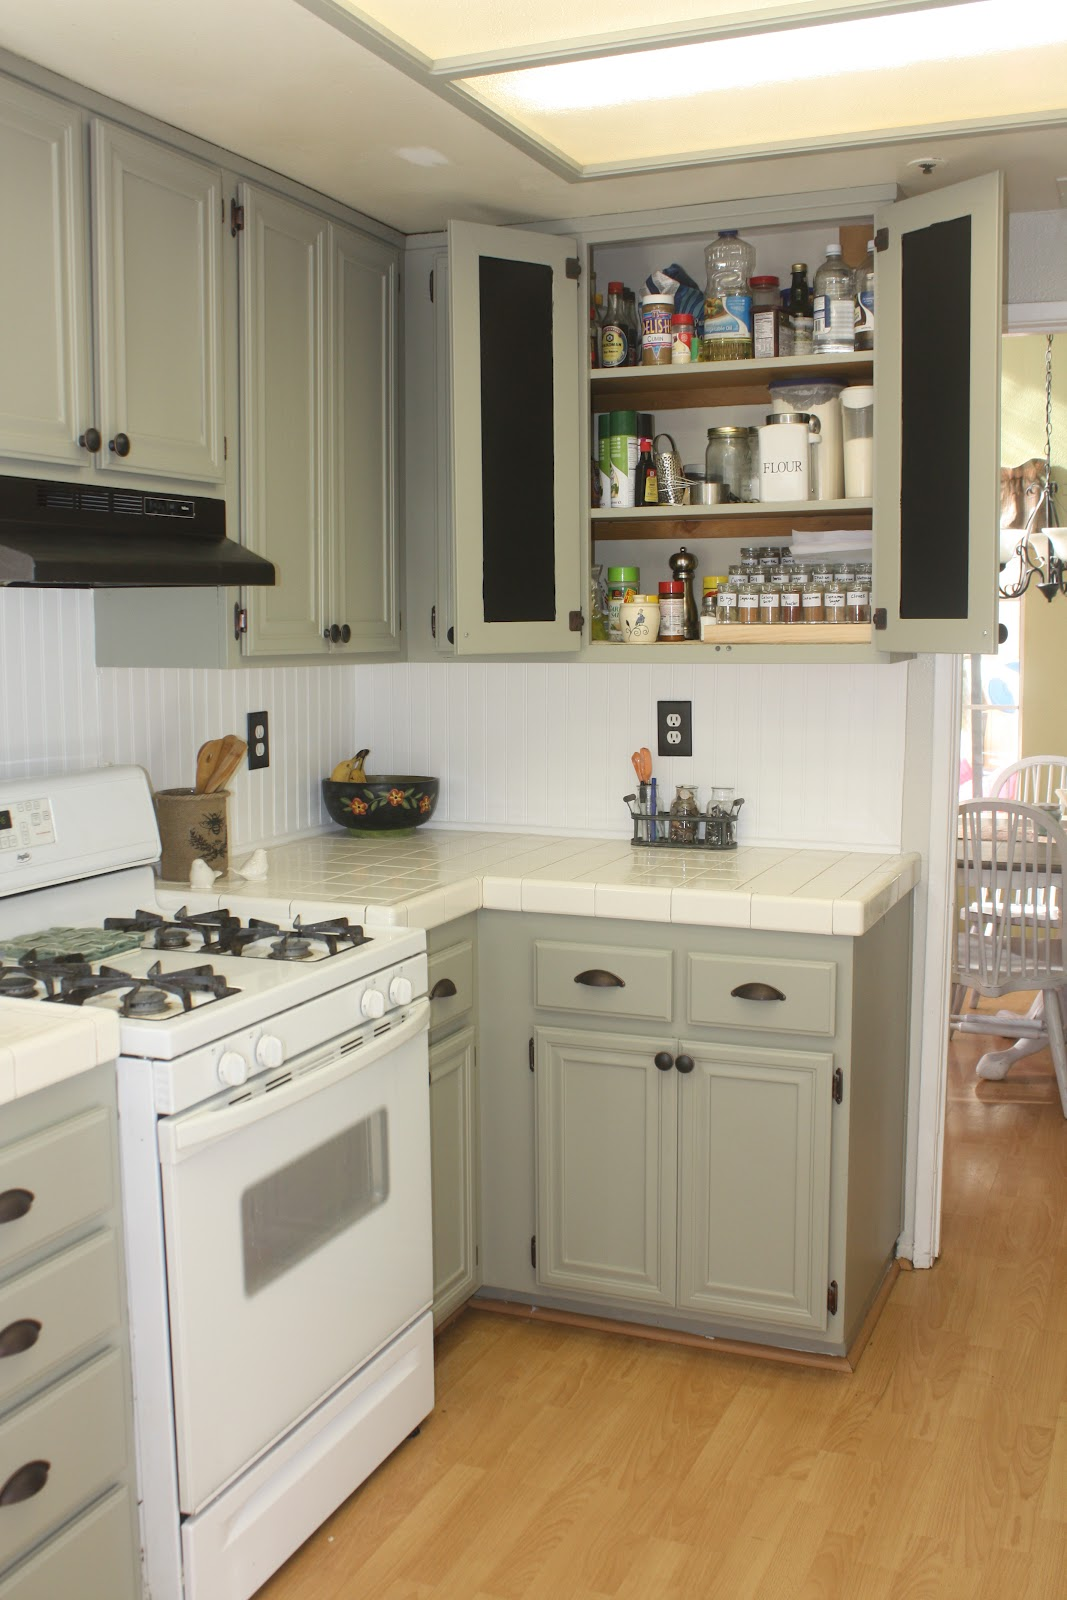 The California Farmhouse: My new kitchen!